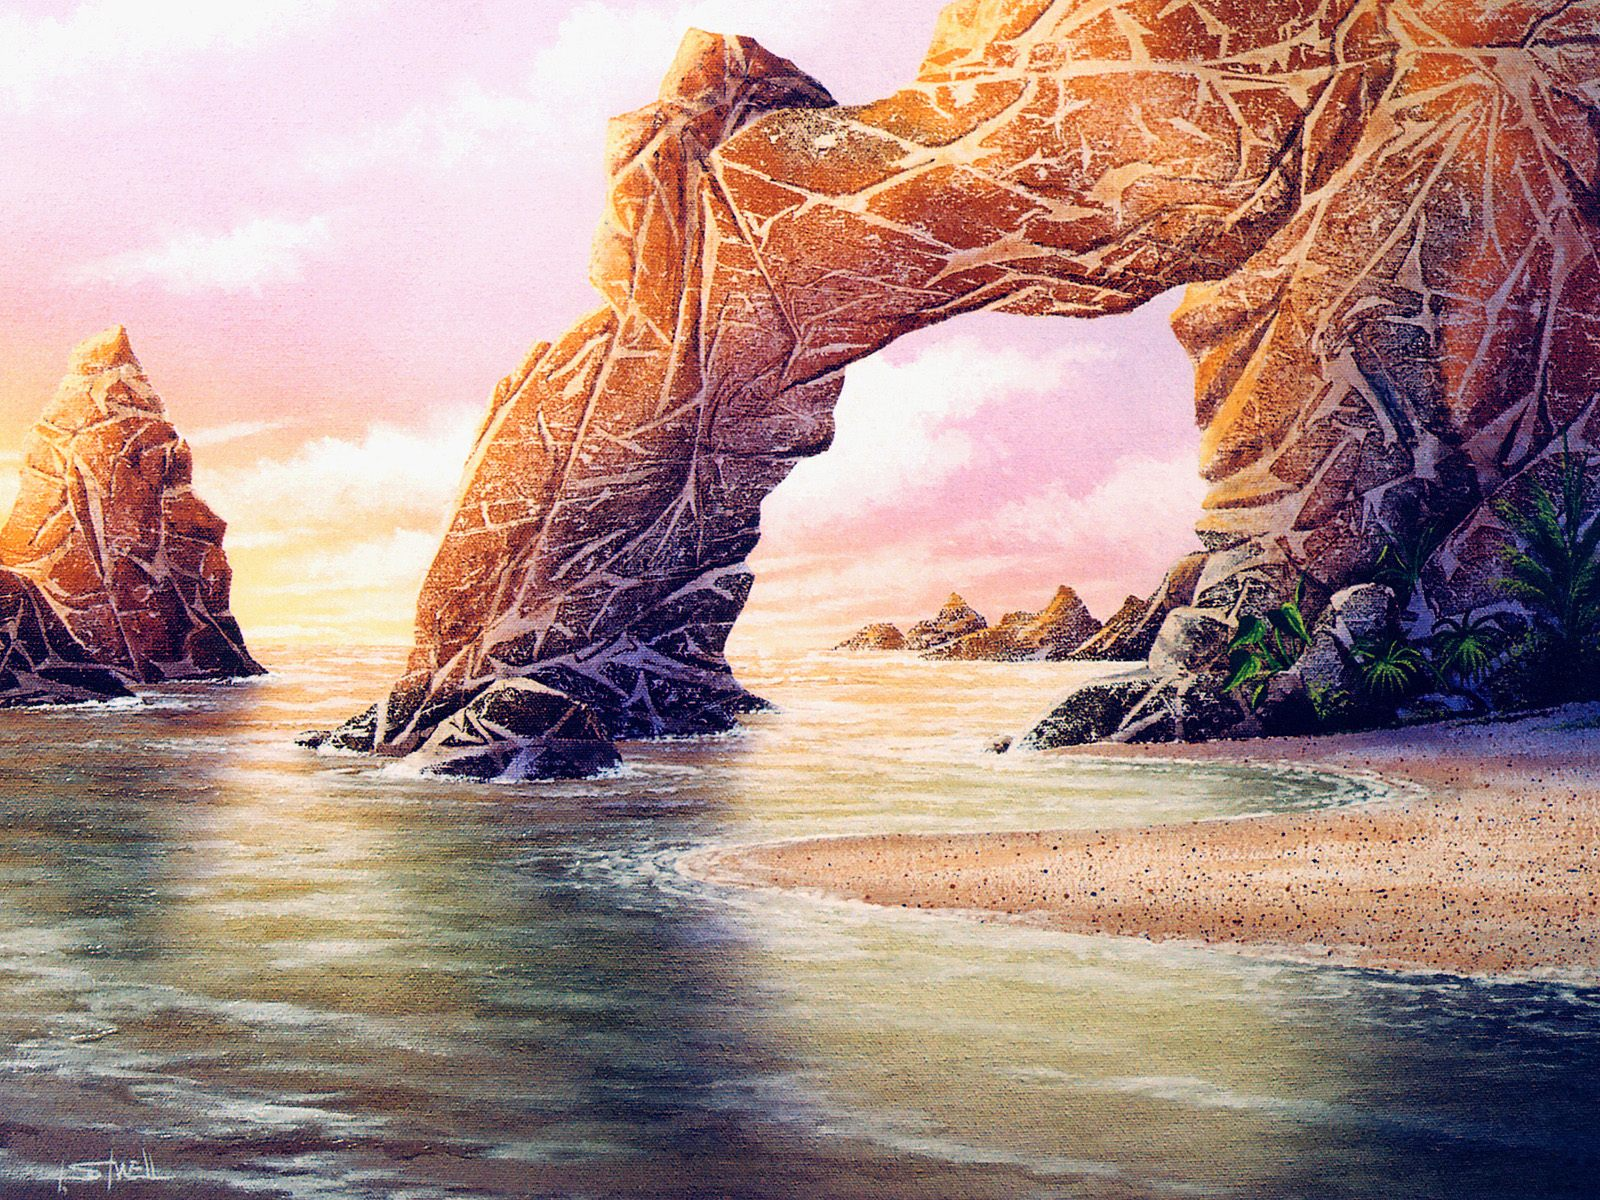 Geomorfologi dasar laut daerah penelitian cenderung tidak beraturan dan. Panitia Geografi: Geomorfologi Pinggir Pantai - Gerbang Laut.